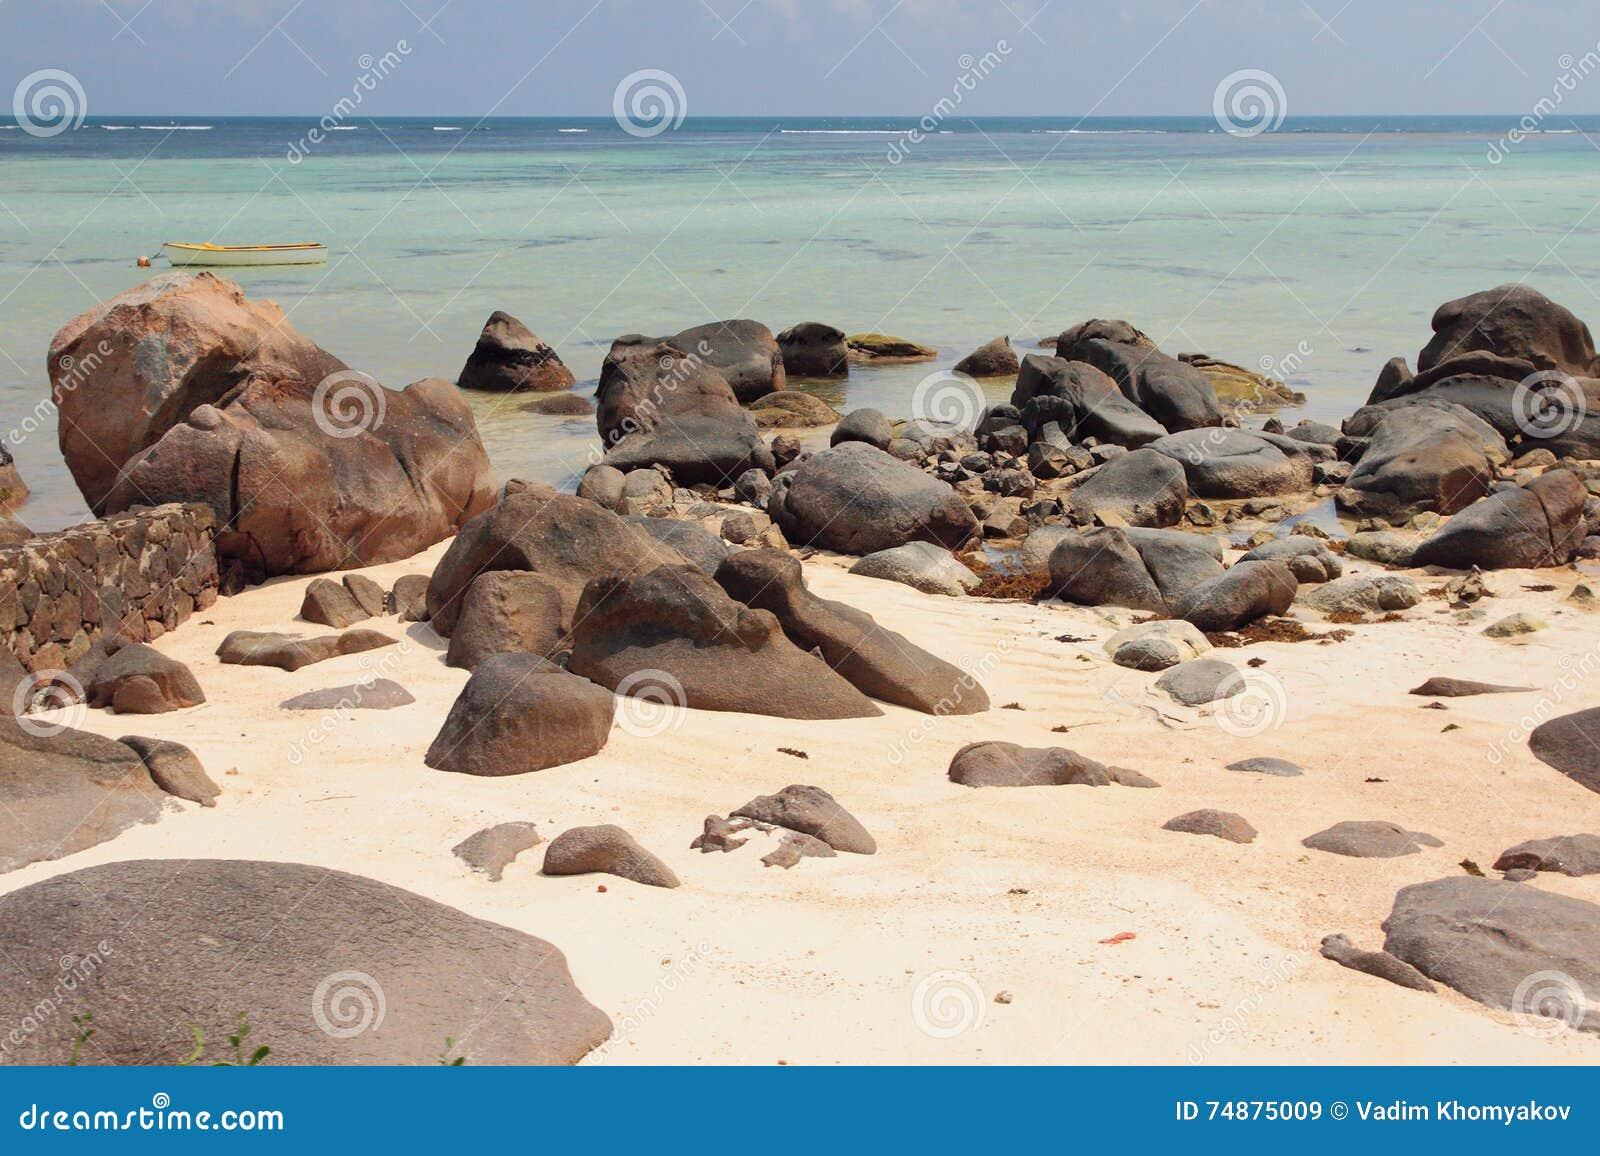 Volcanic boulders and stones on sandy beach. Mahe, Seychelles